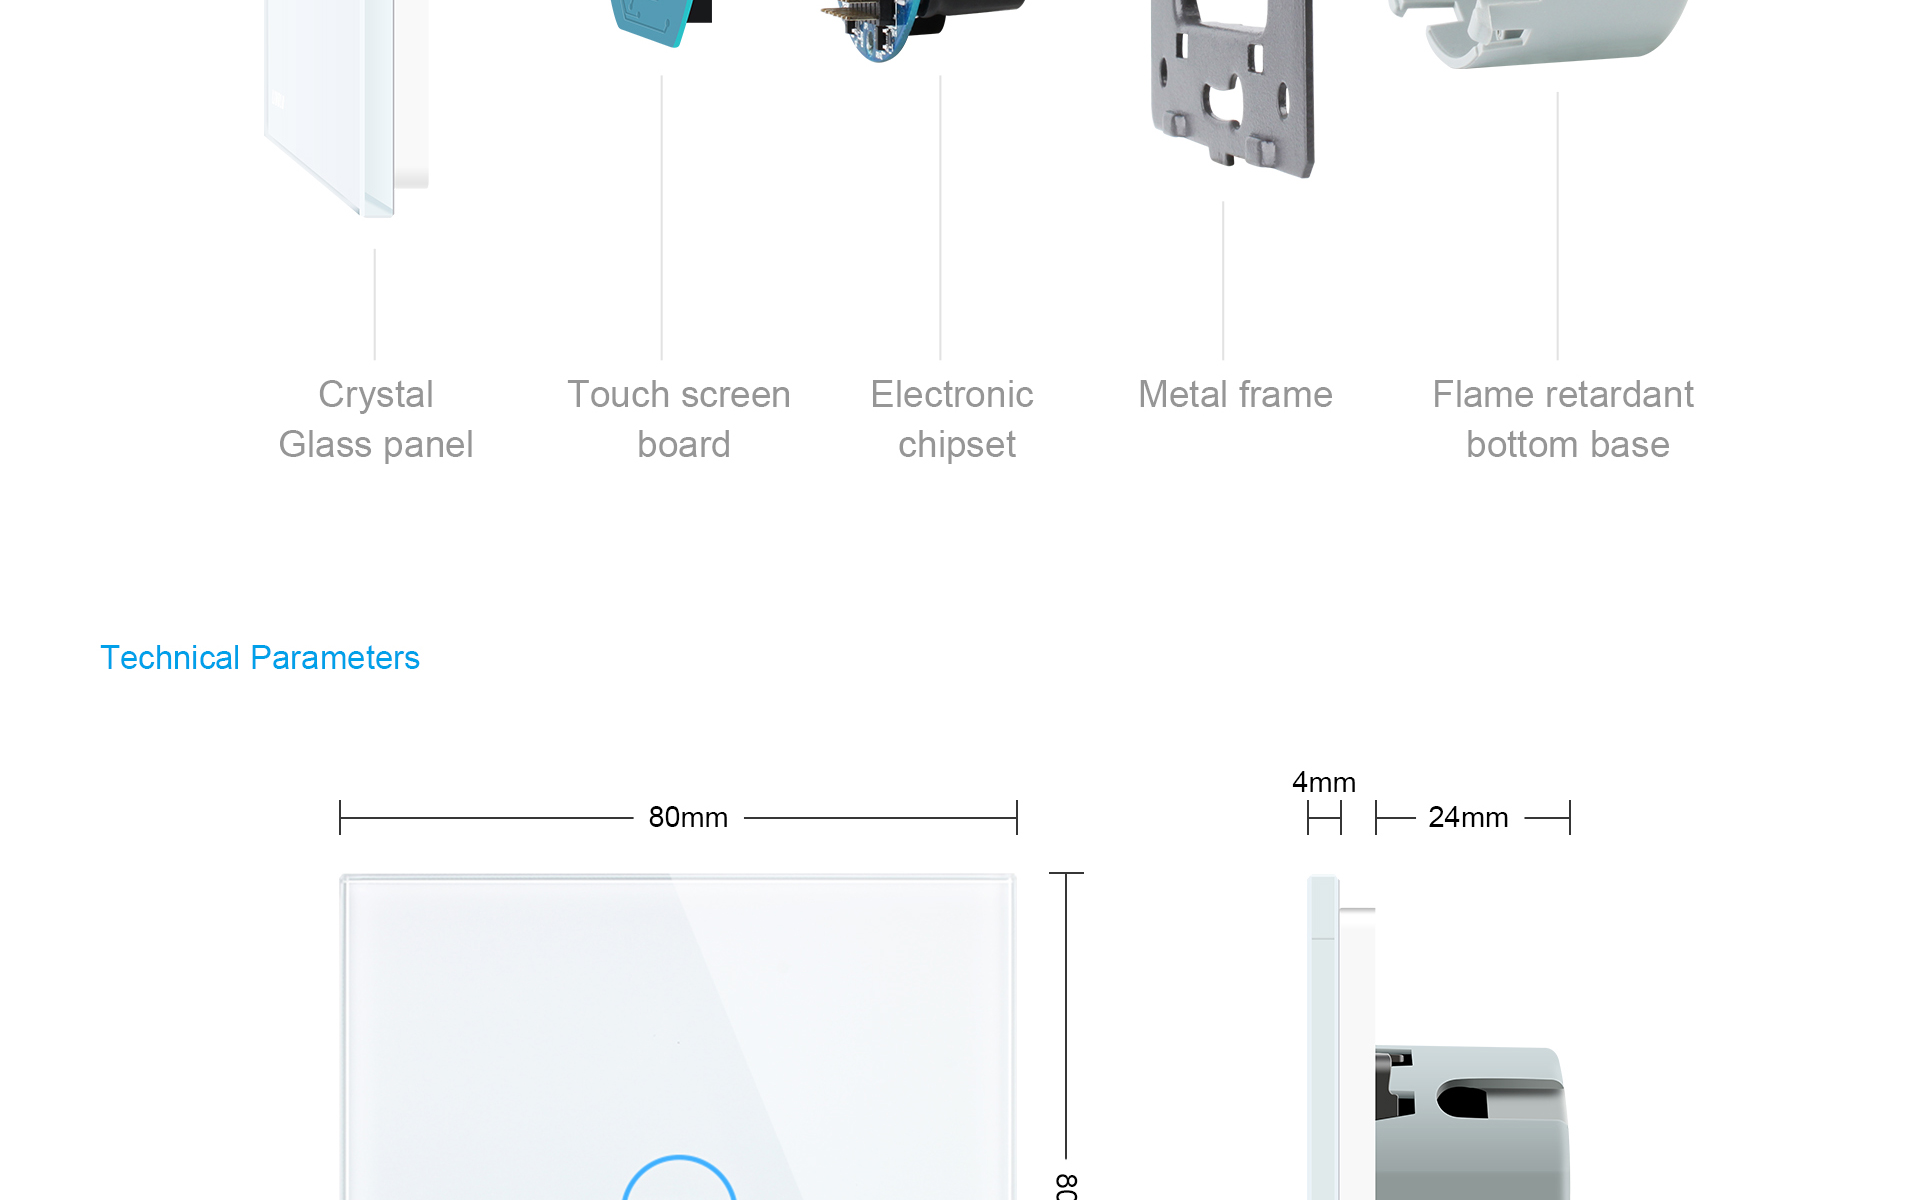 Way Switch Wiring Diagram Wiring Diagram Leviton Decora 3 Way Switch